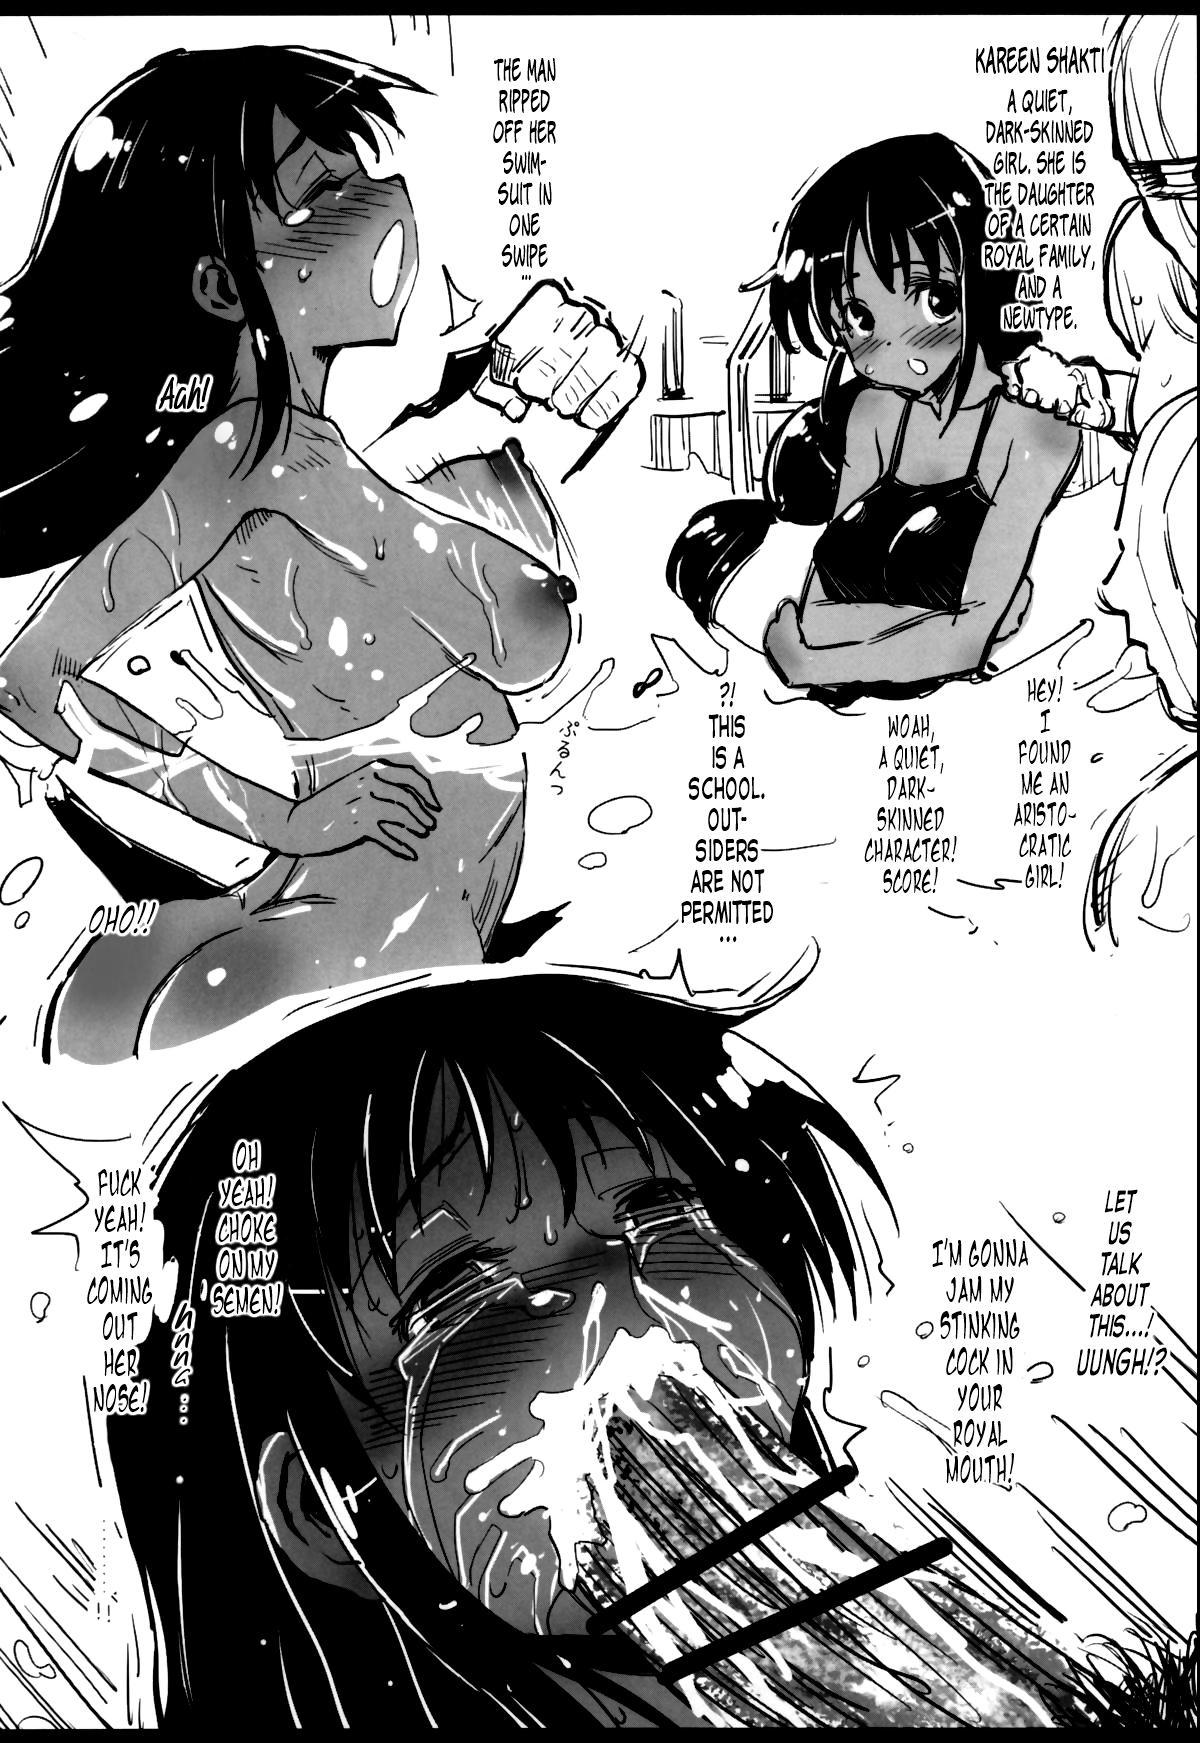 [Eromazun (Ma-Kurou)] Saint Helena Gakuen ~ Terrorist ni Senkyosareta Jogakuen de Rape Matsuri!~   Saint Helena Academy ~A School Occupied by Terrorists Becomes a Rape Festival!~ (Various) [English] [B.E.C. Scans] 39